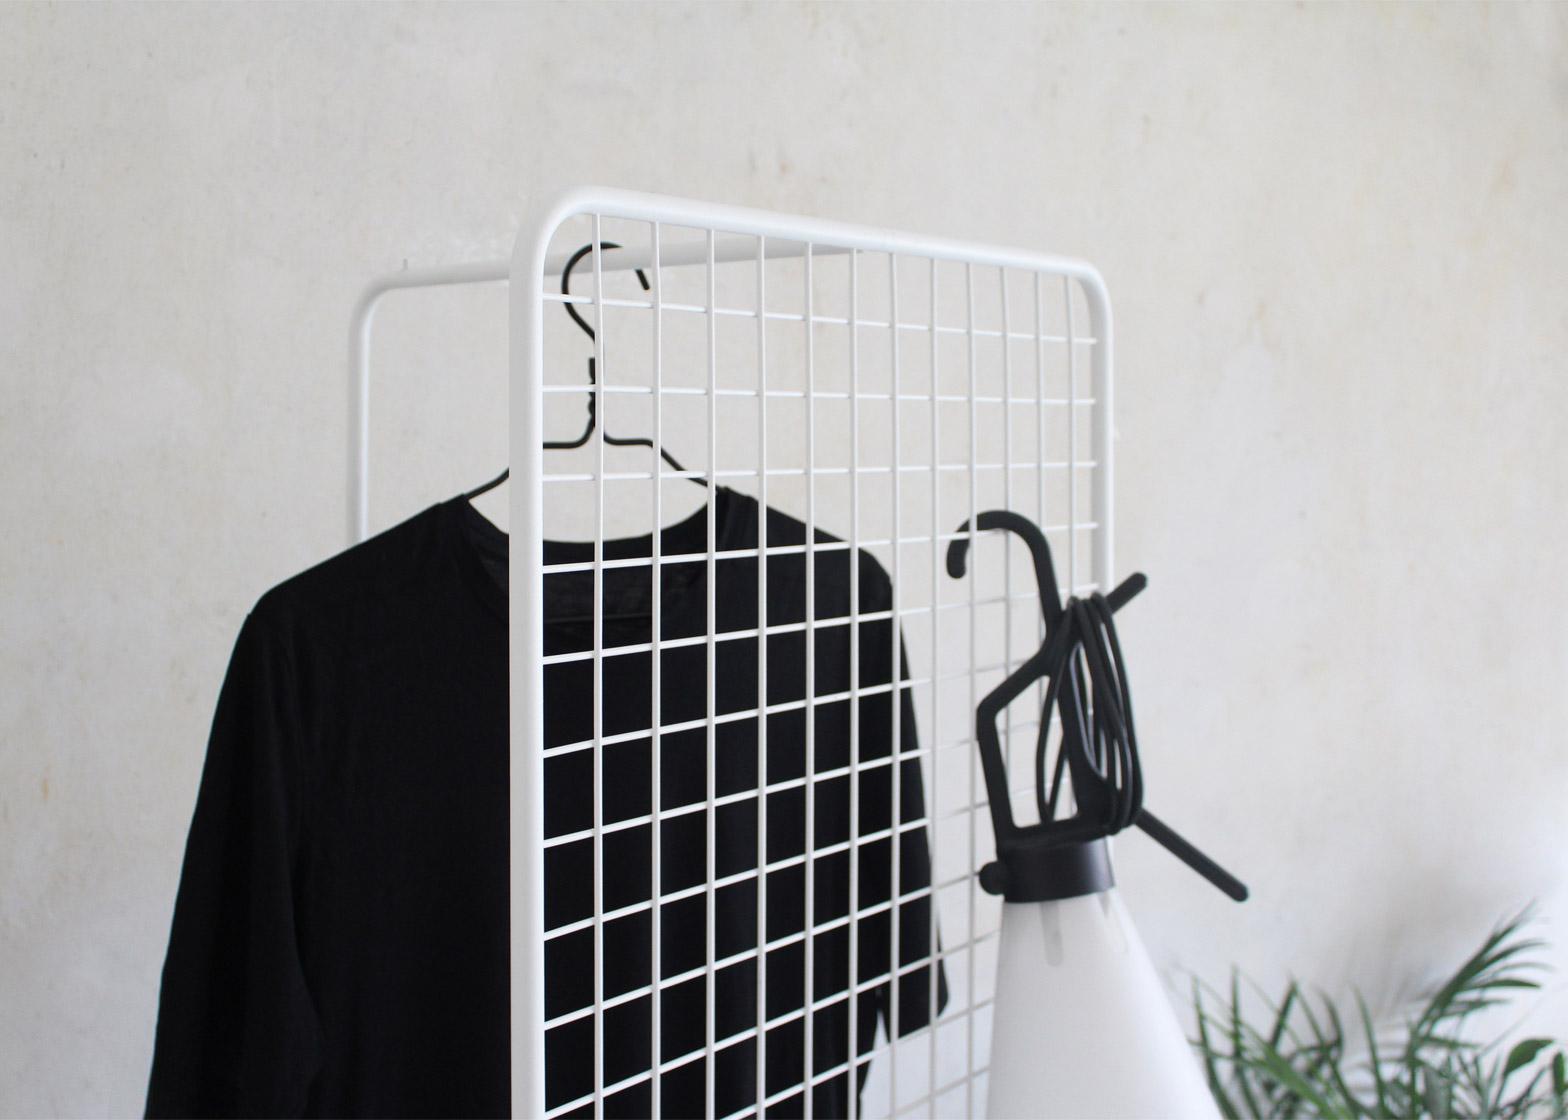 Grid clothing rail by Thomas Schnur for Milan 2016